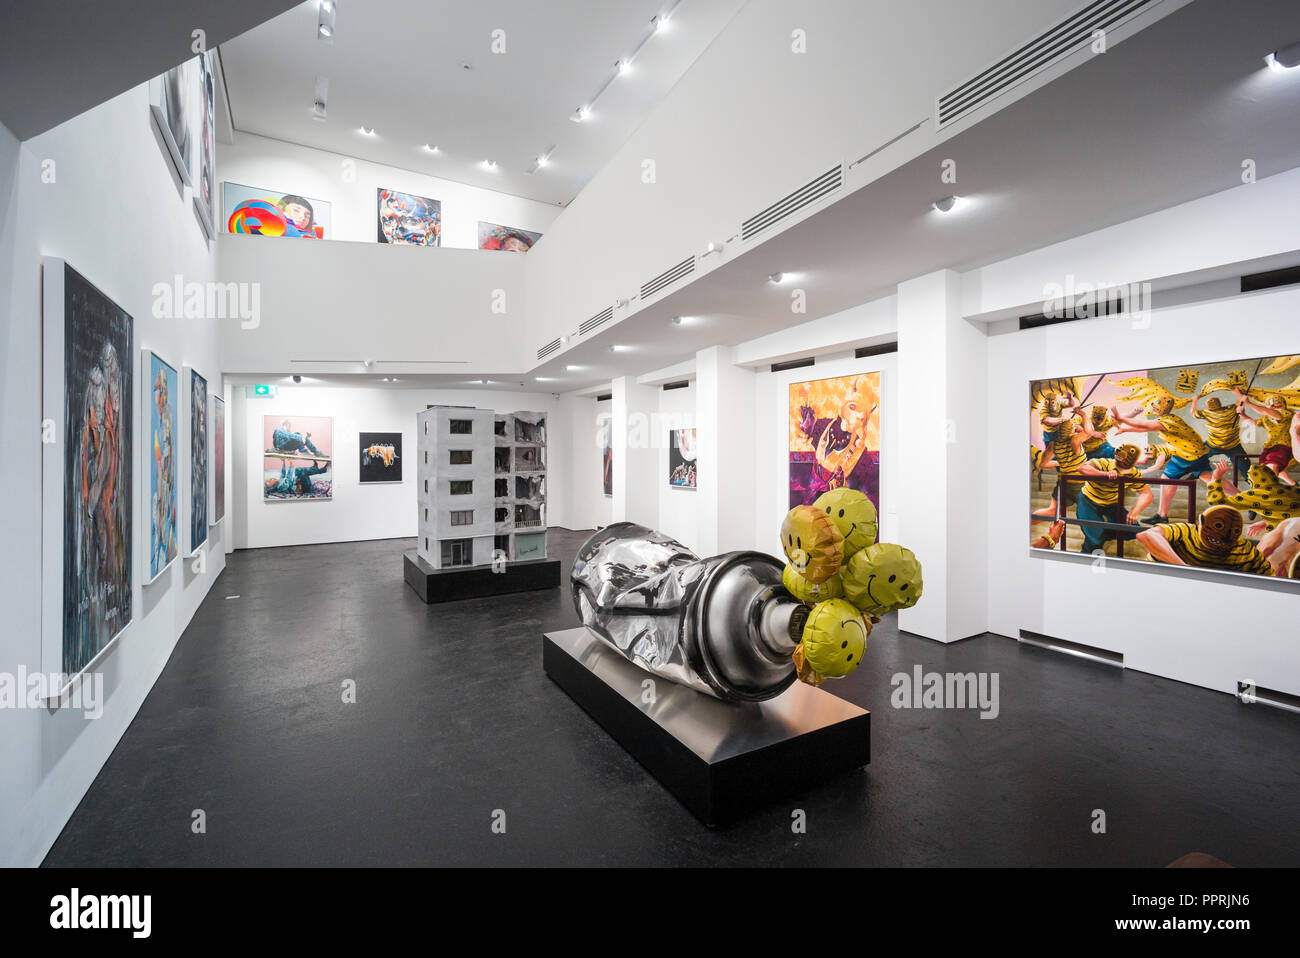 Berlino. Germania. Nazione urbane Museo Urbano per l'arte contemporanea, Bülowstraße 7, Schöneberg. Immagini Stock